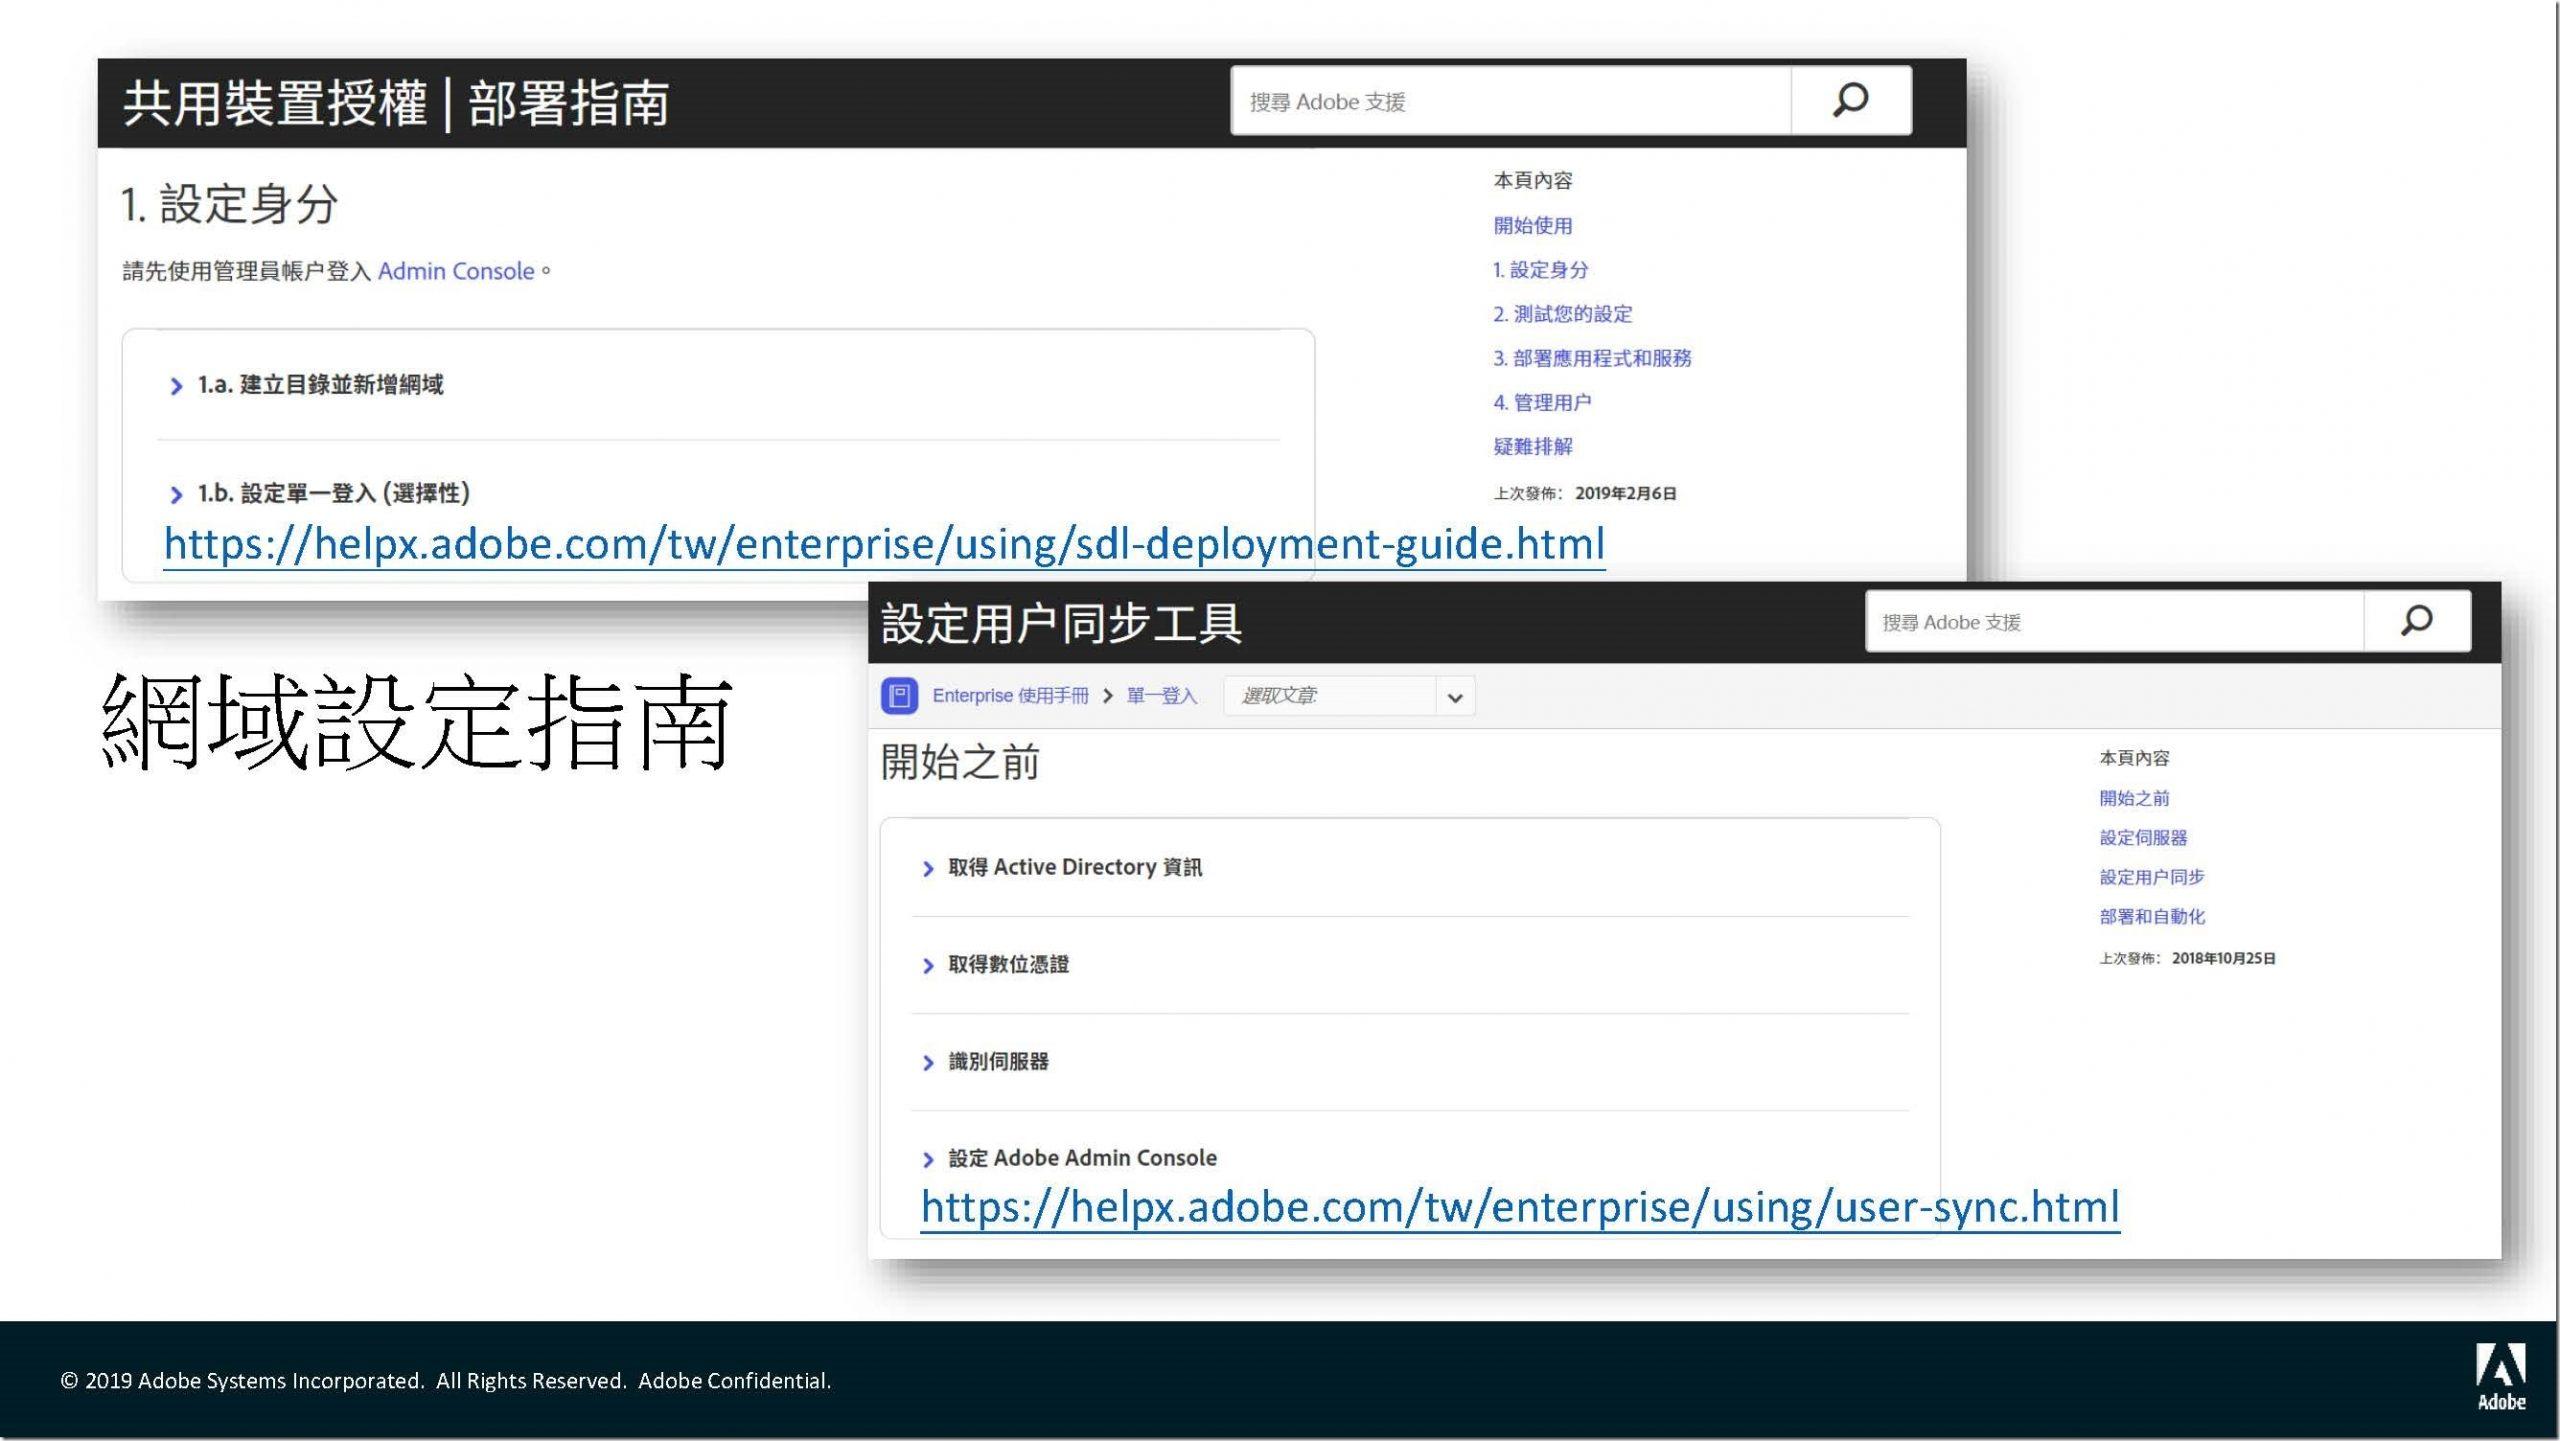 Adobe 共用裝置授權安裝指南_教育通用_頁面_29